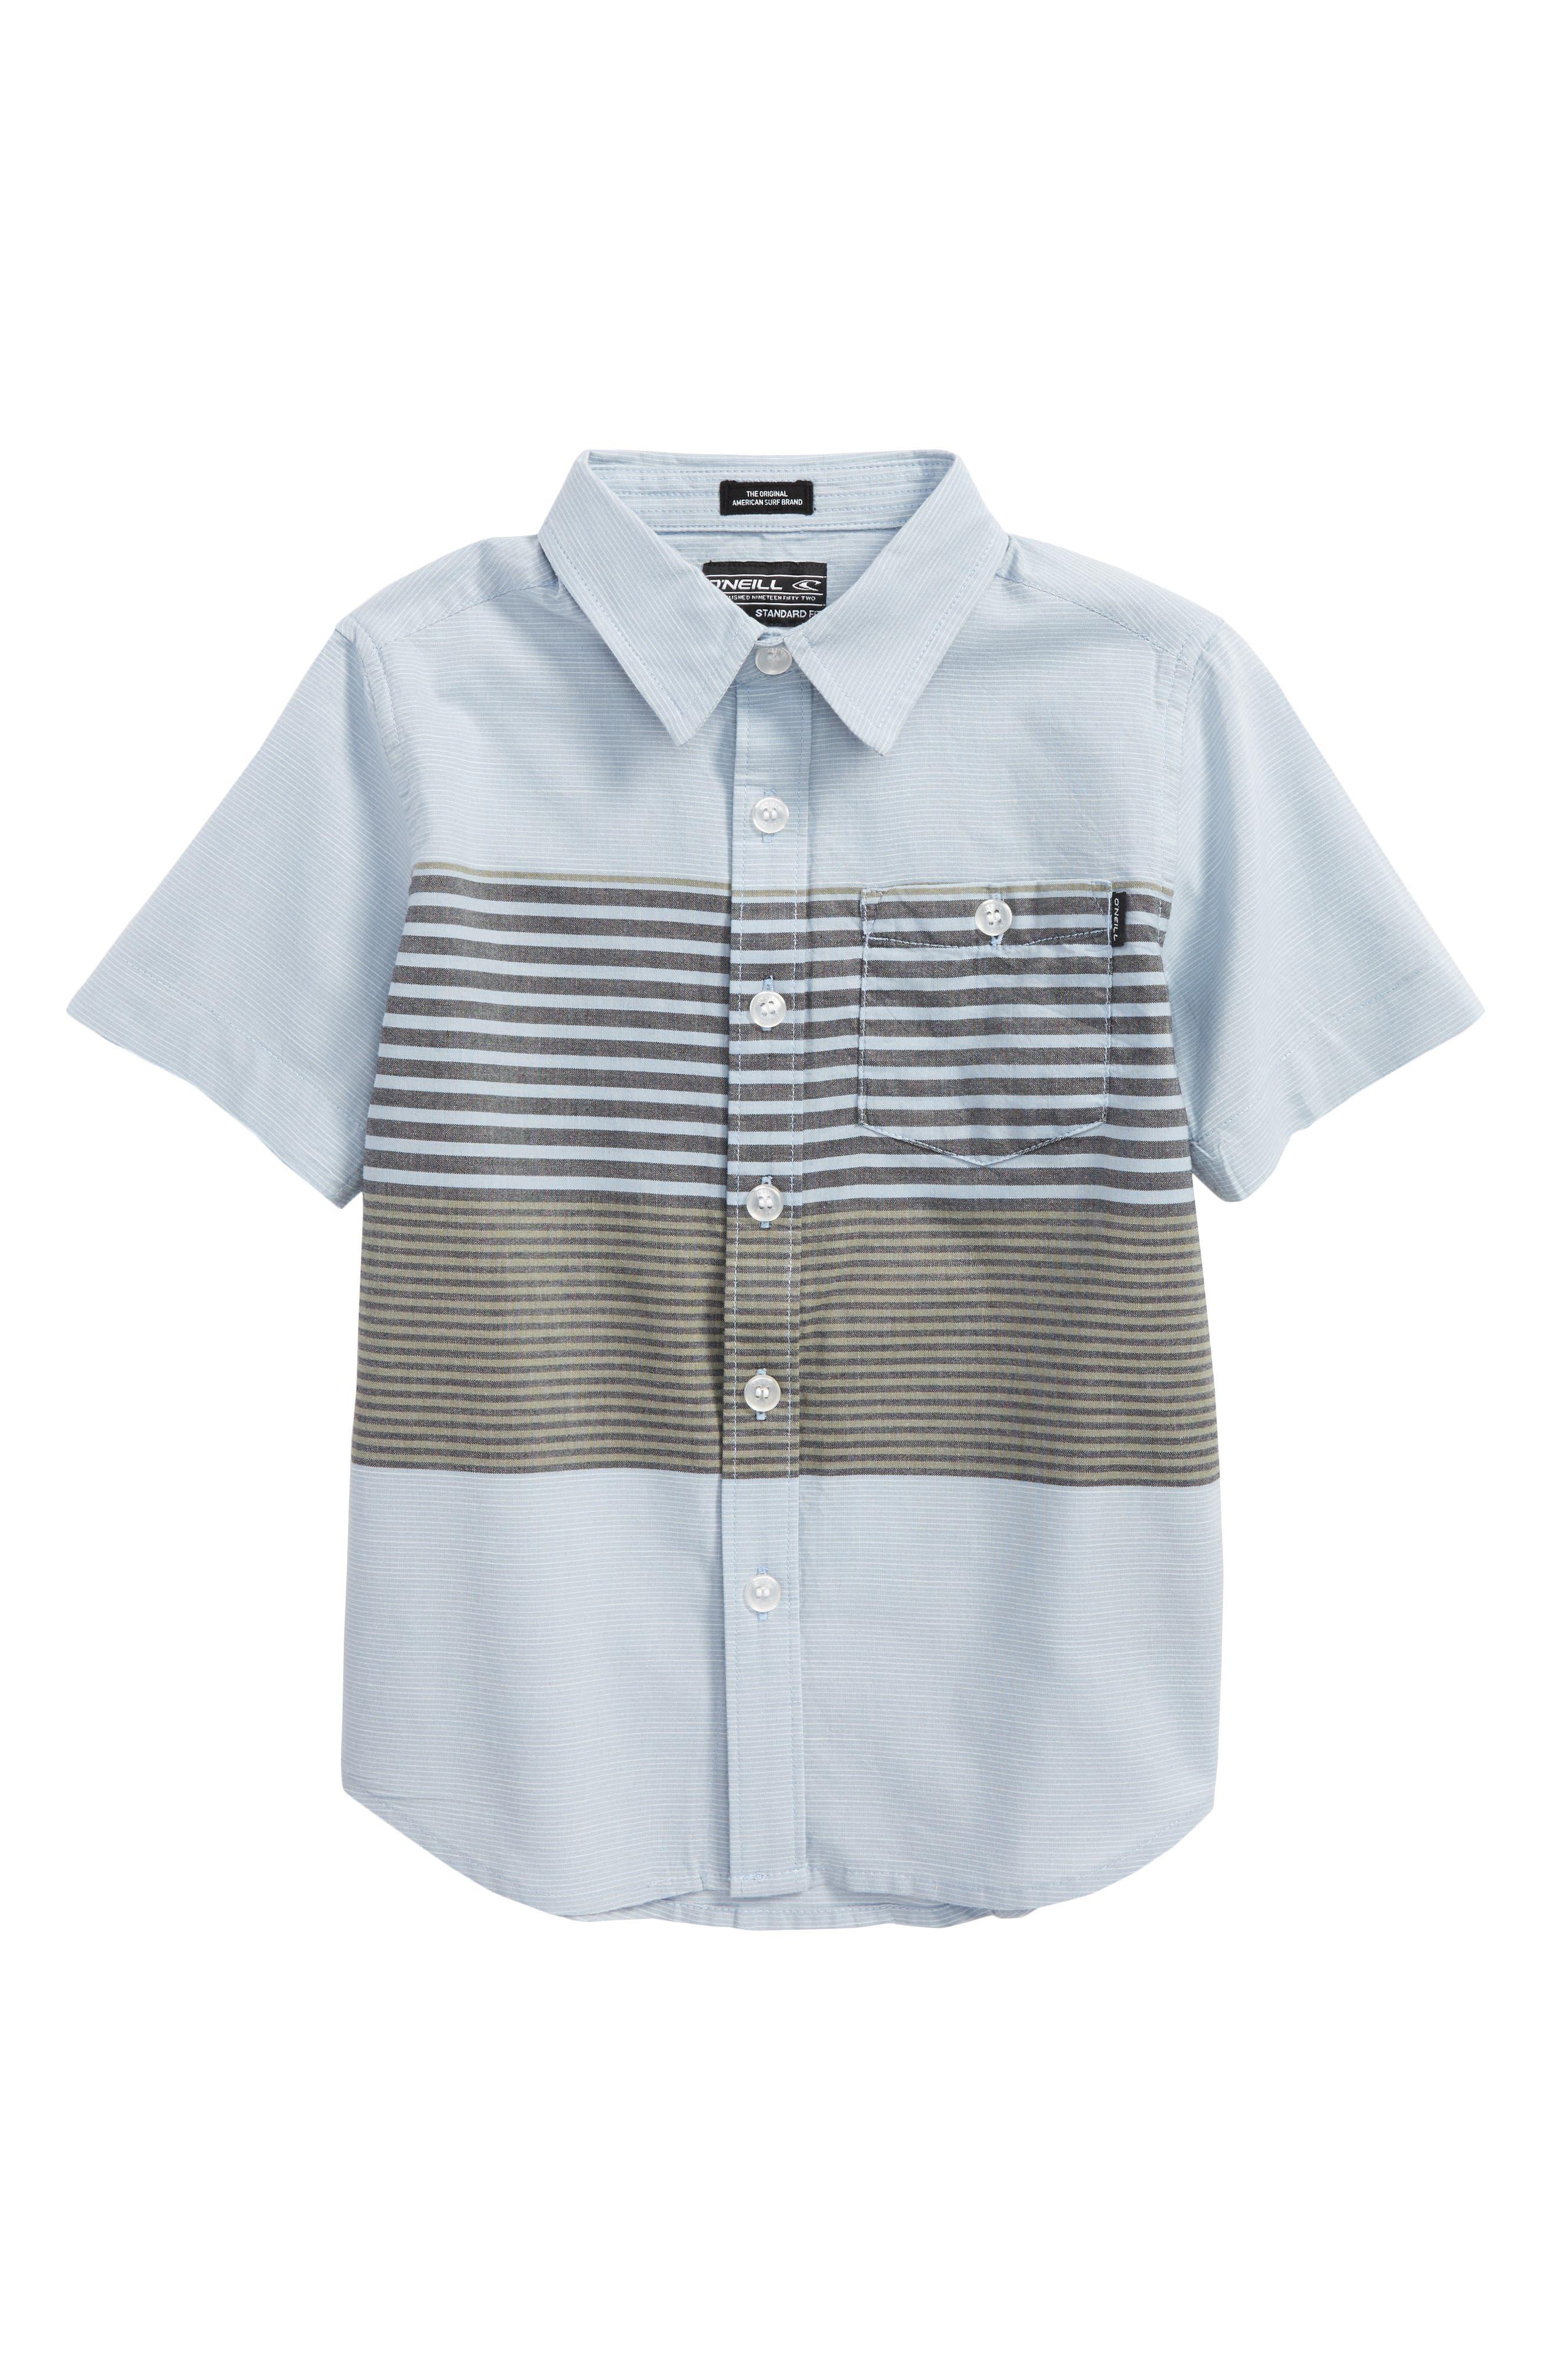 Alternate Image 1 Selected - O'Neill Altair Woven Shirt (Little Boys)